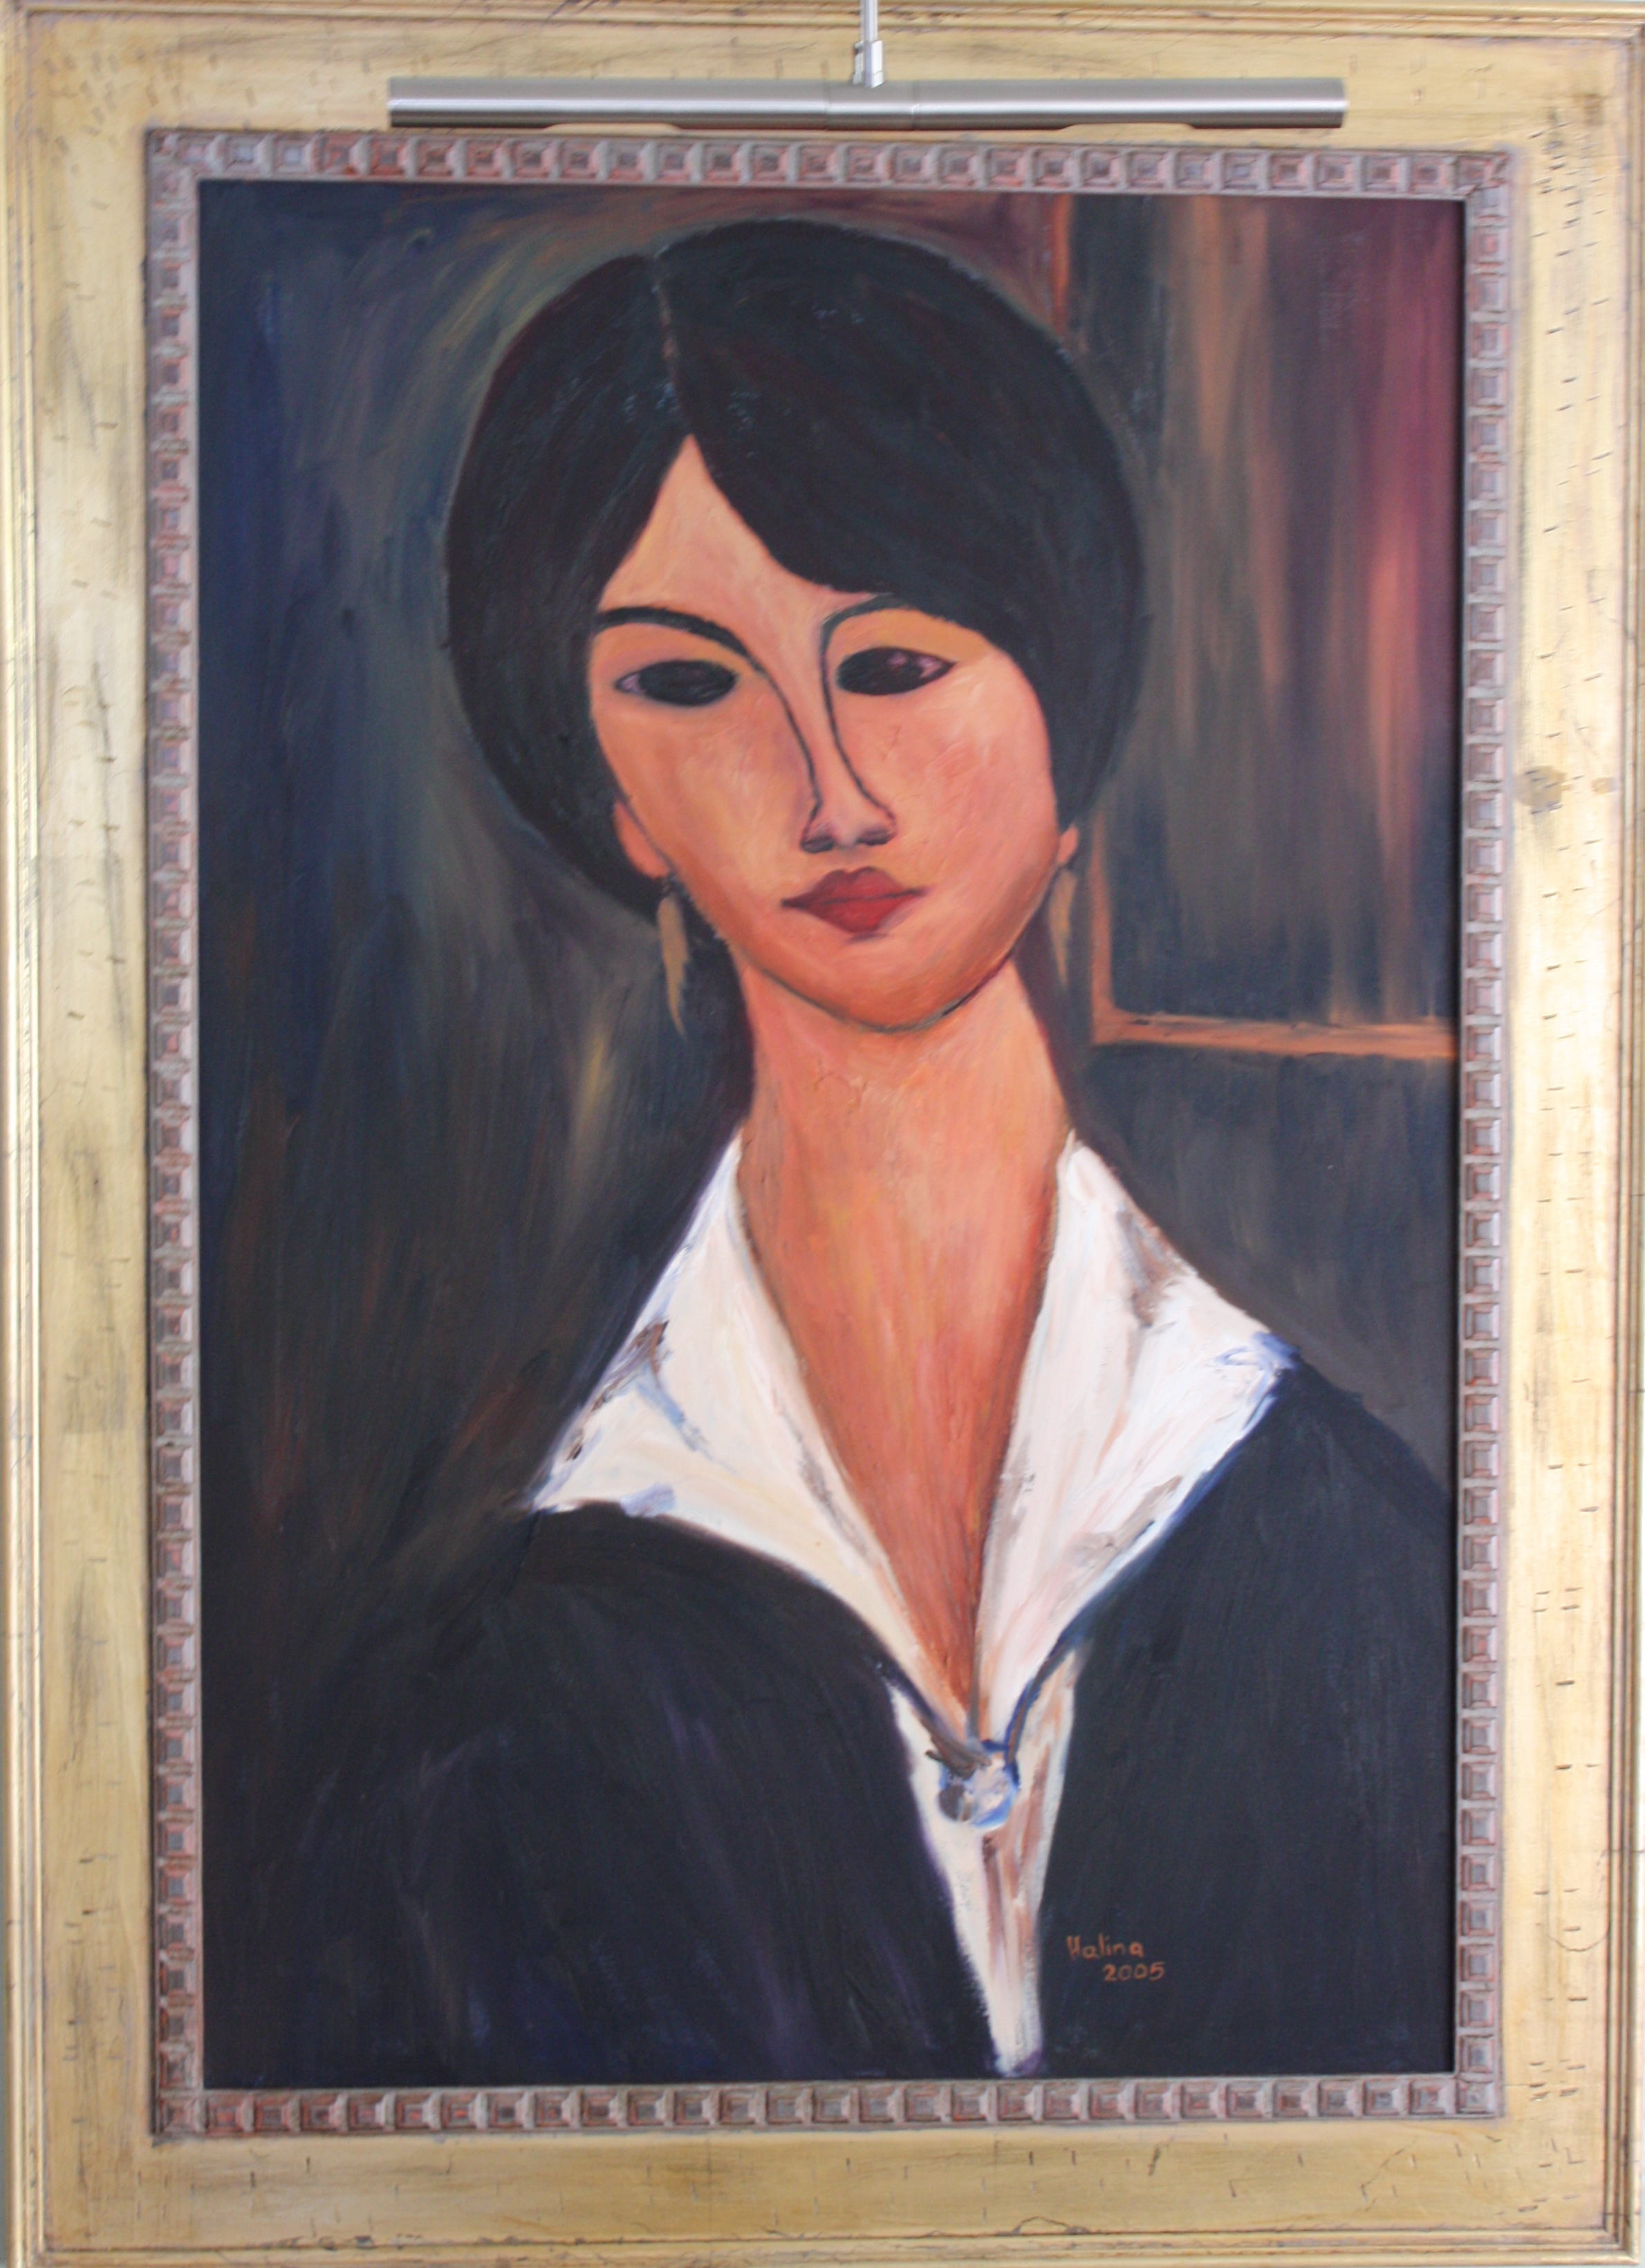 Madigliani - Framed.JPG